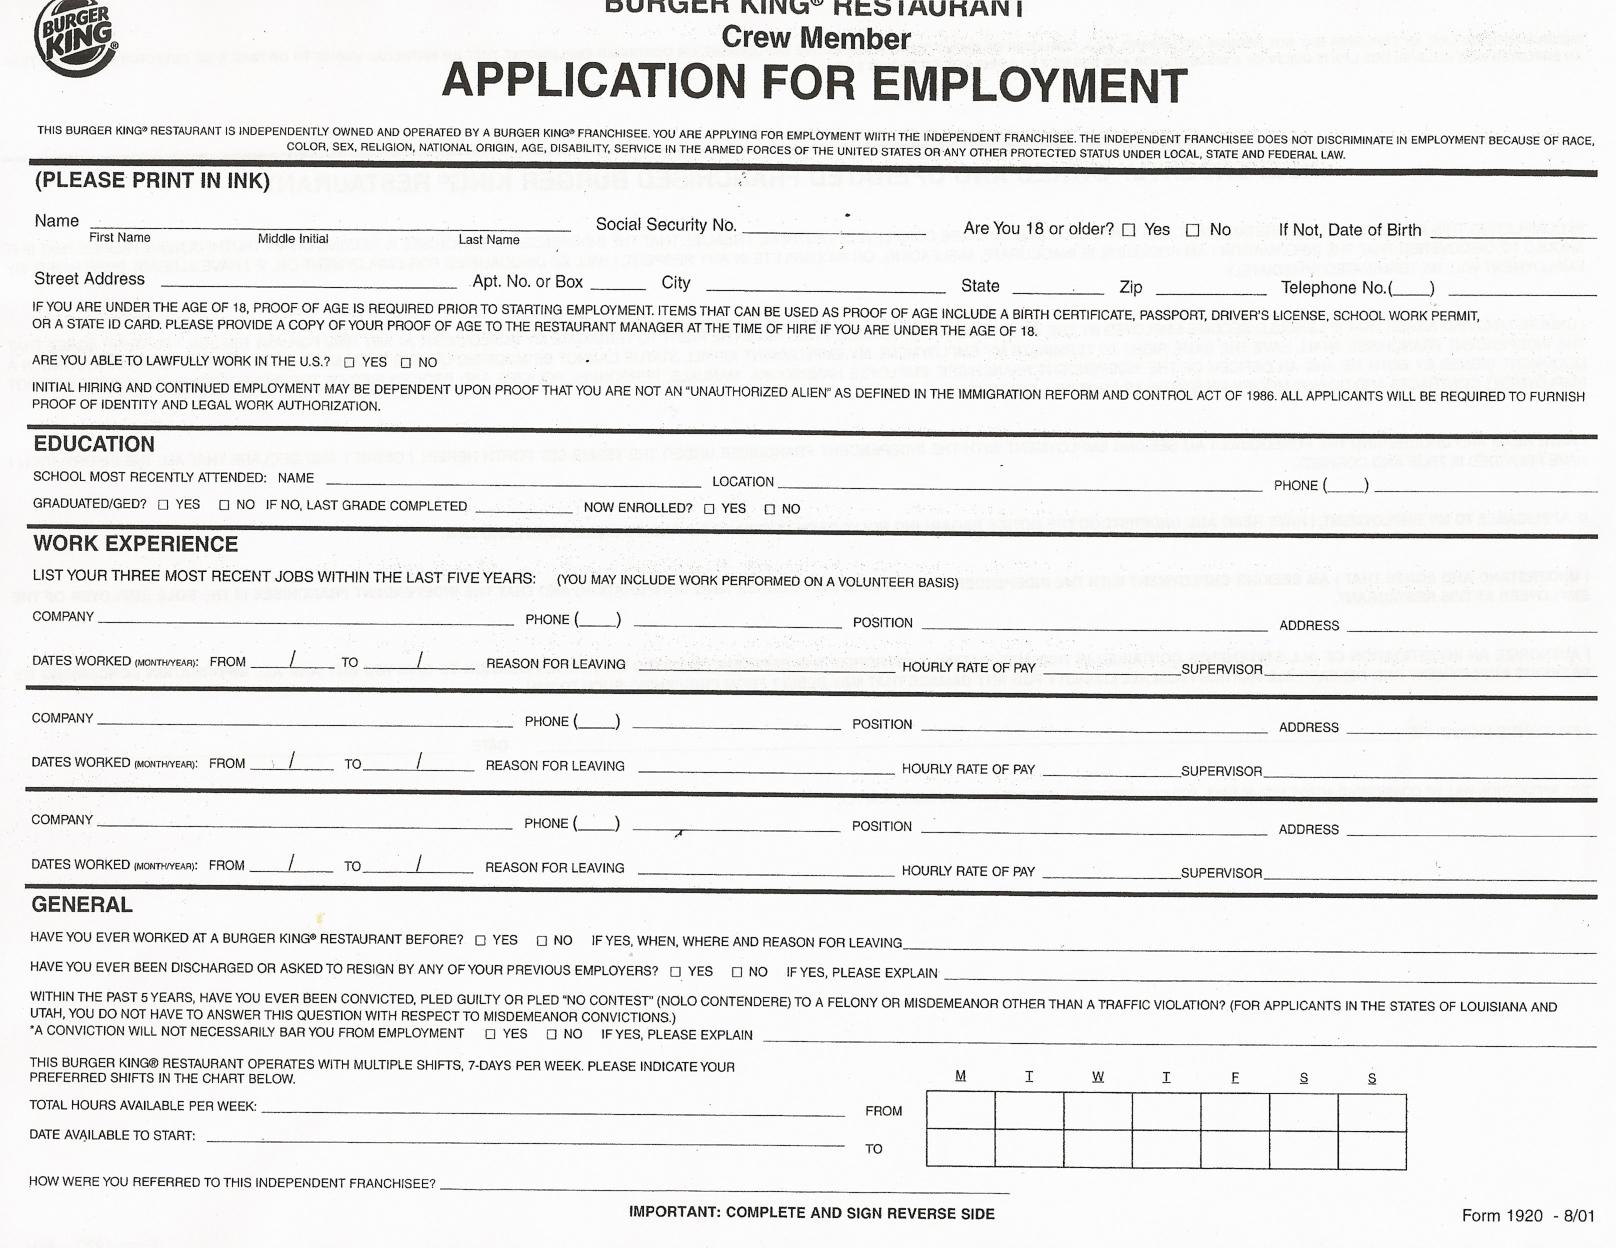 Job Application Printable Job Applications Printable Job Application - Free Online Printable Applications